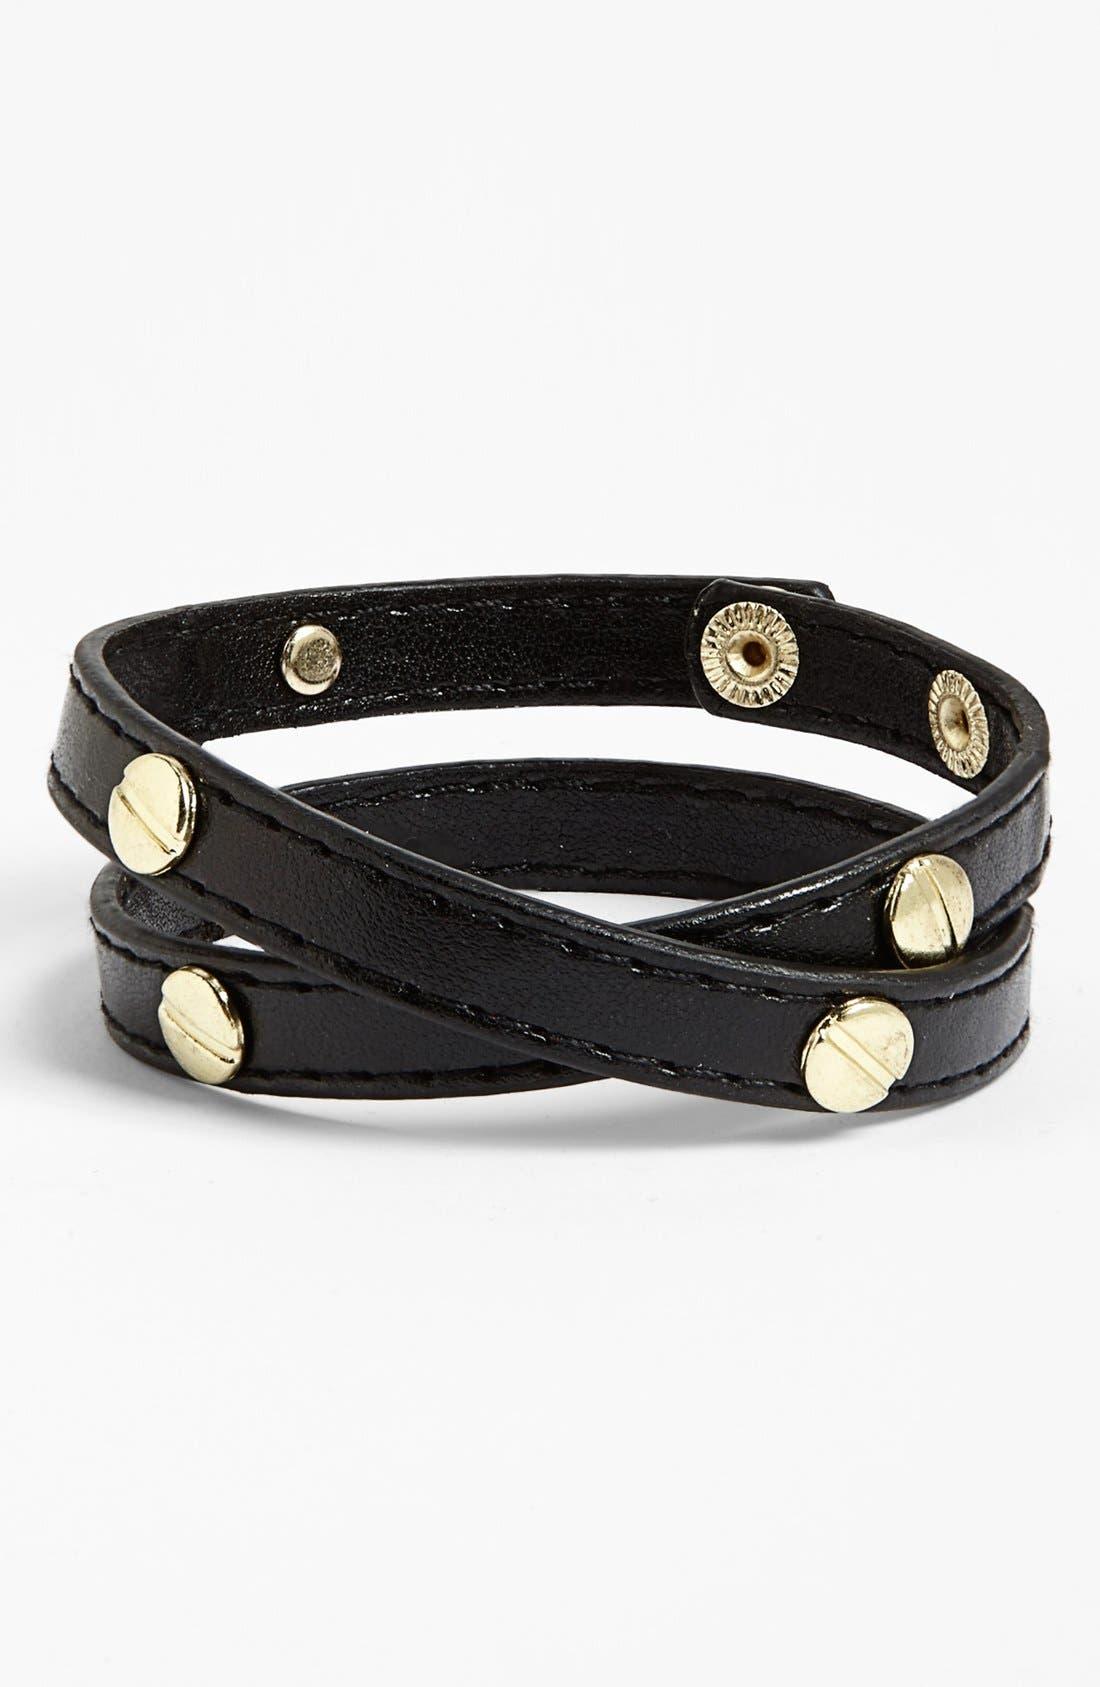 Alternate Image 1 Selected - Carole Studded Faux Leather Wrap Bracelet (Juniors)